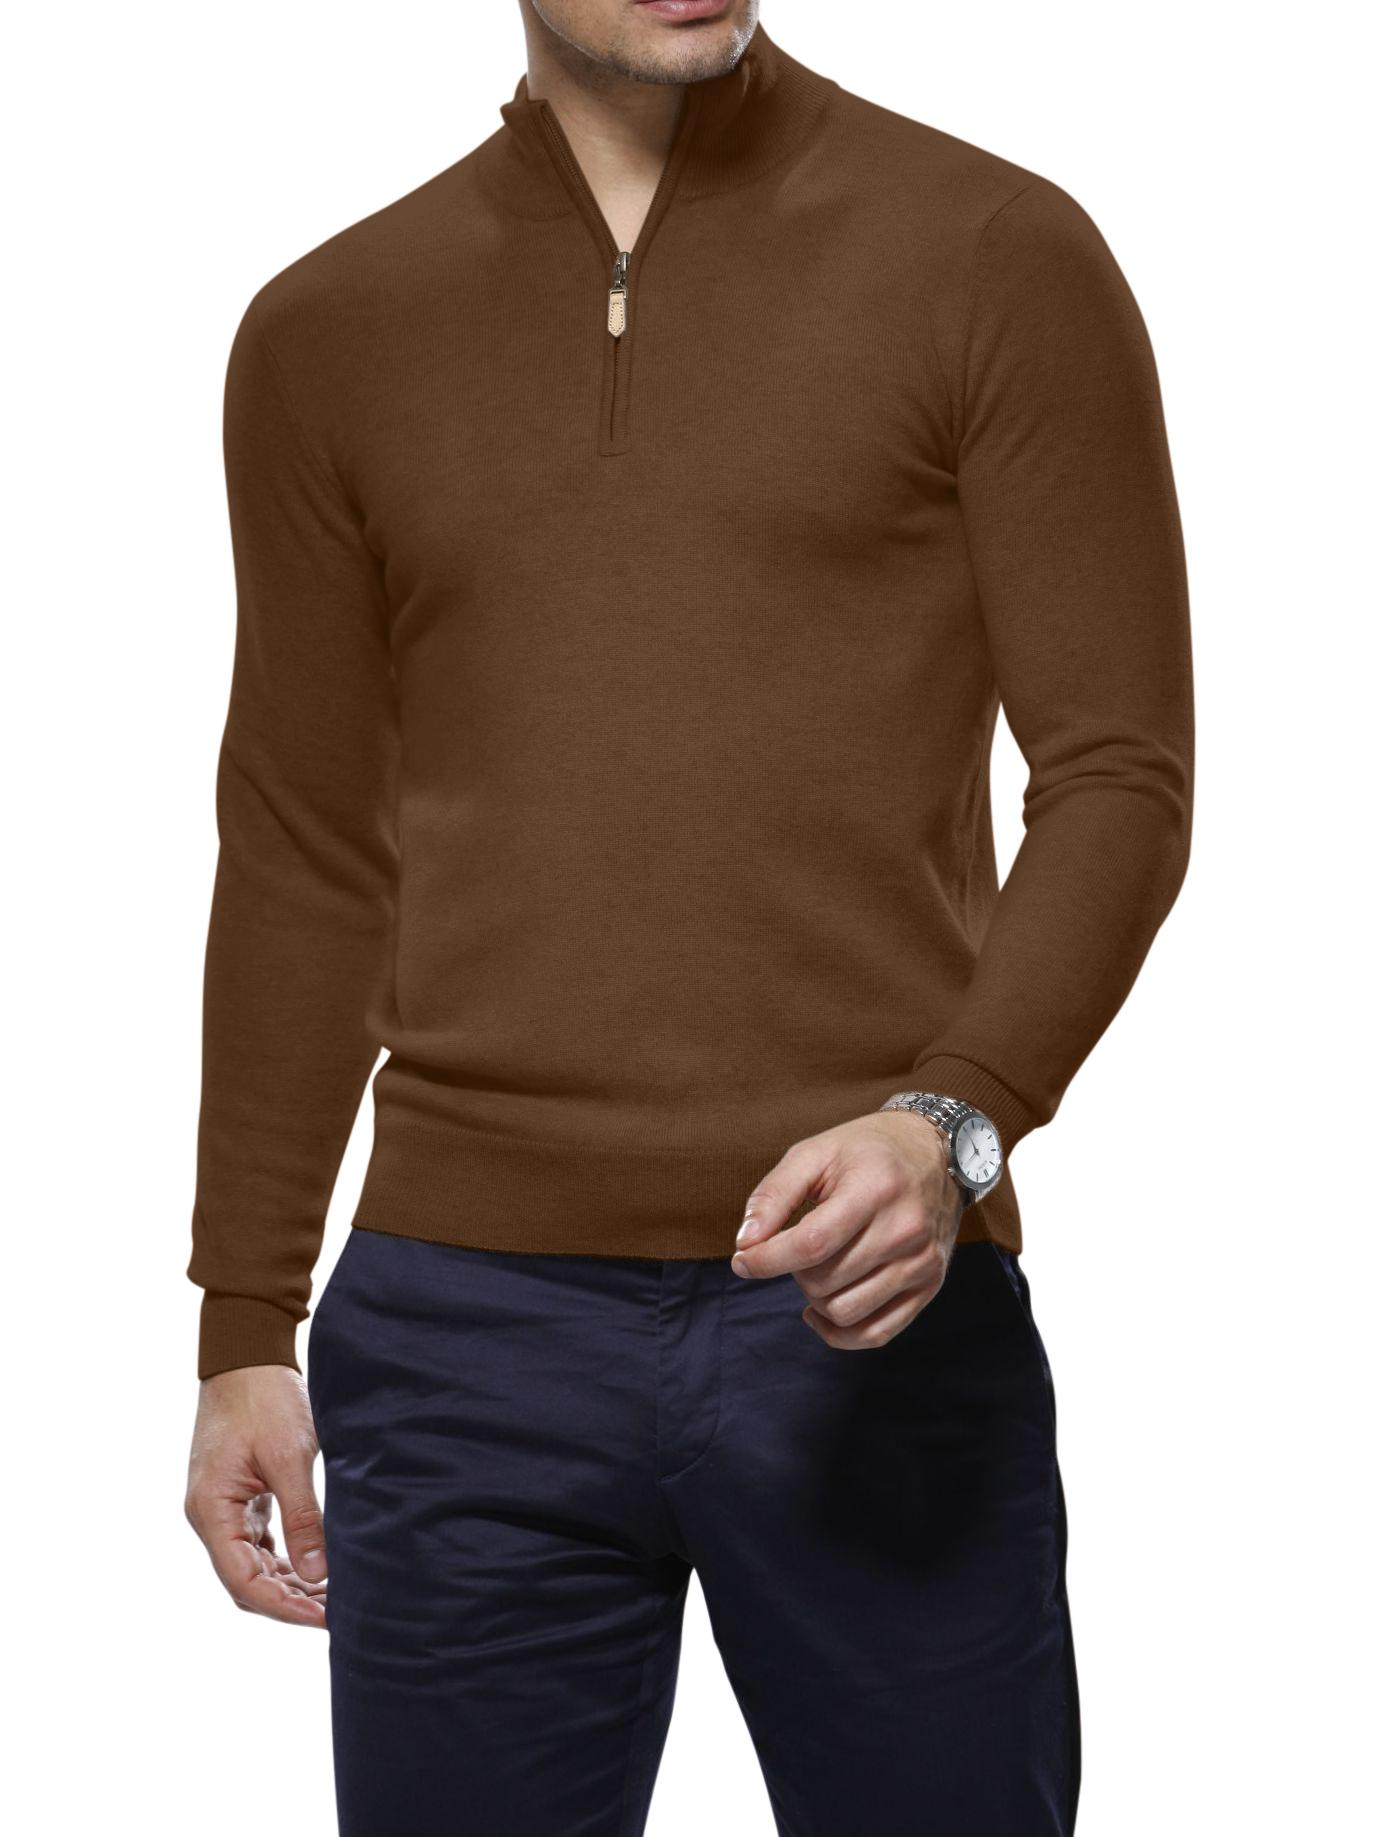 Syrup Merino Wool 1/4 Zip Mock Sweater